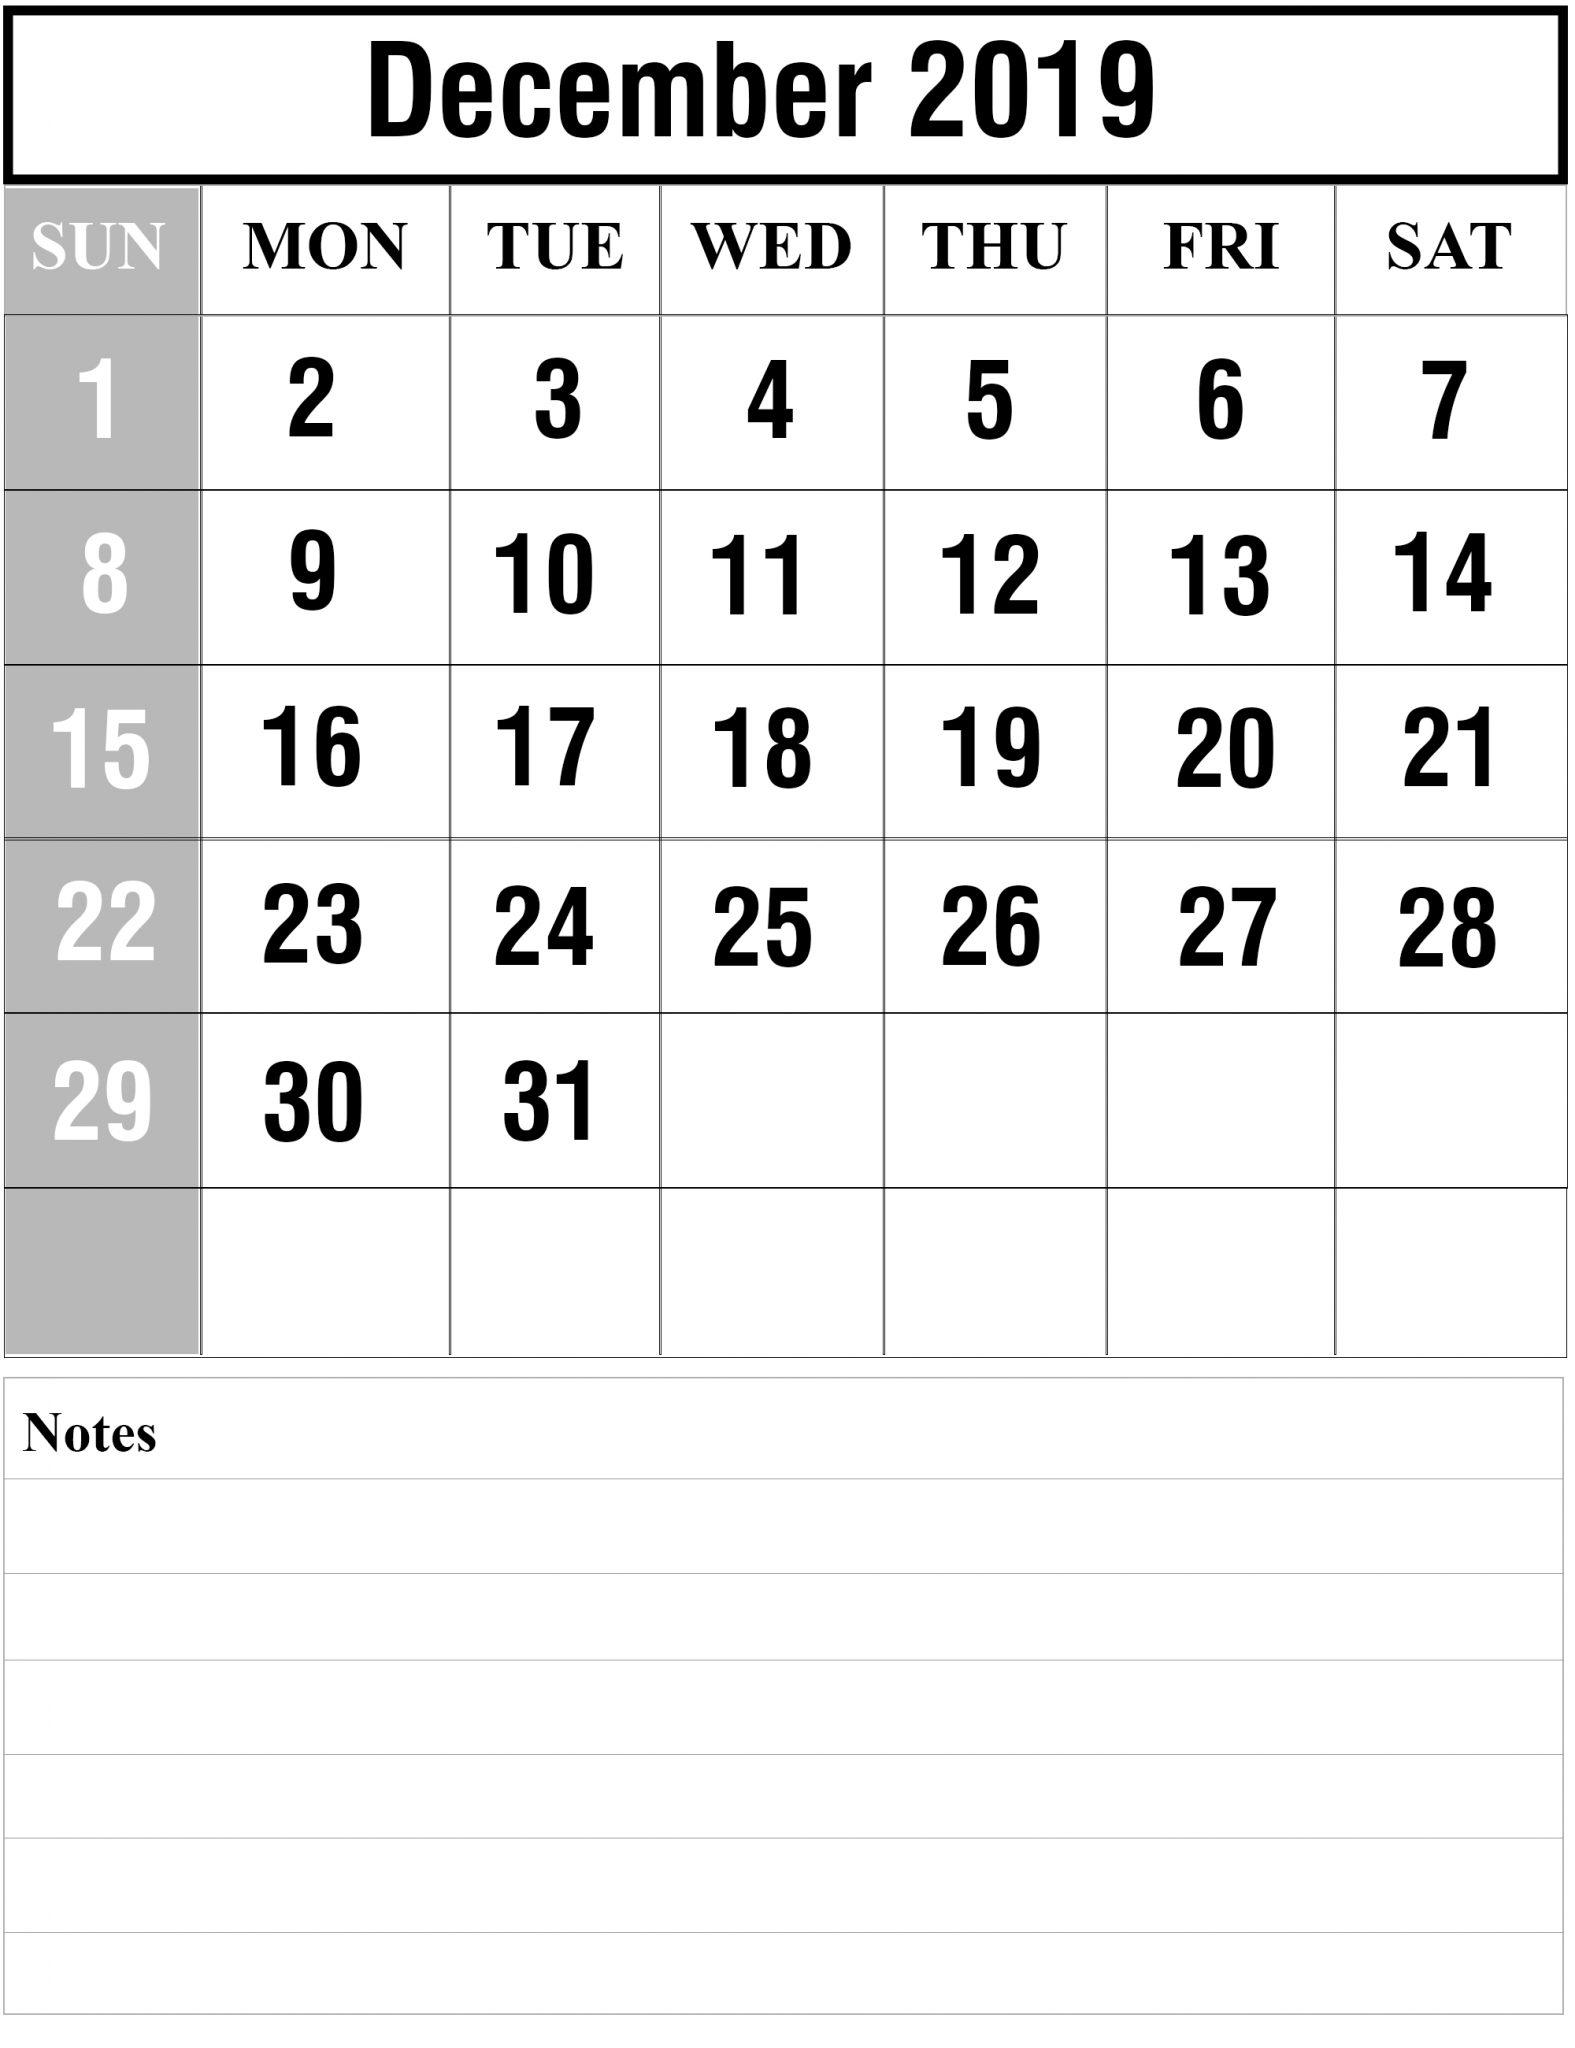 Free Multi-Dose Vial 28-Day Expiration Calculator :-Free Calendar Template